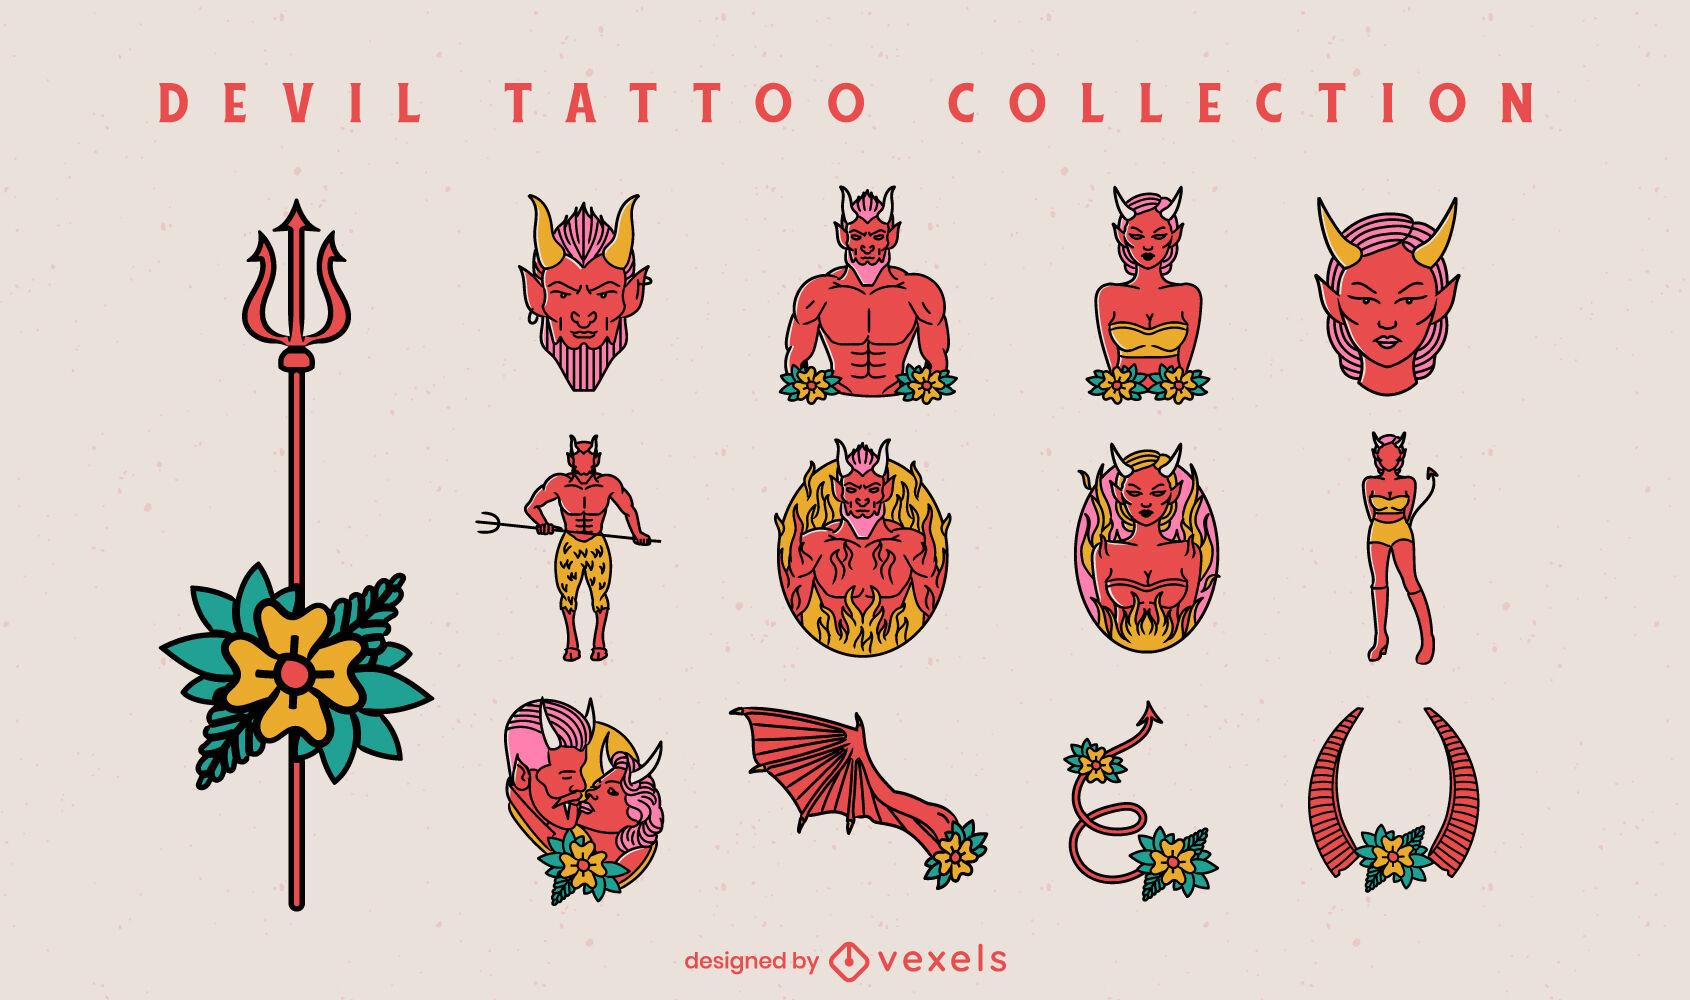 Conjunto de caracteres del tatuaje del diablo